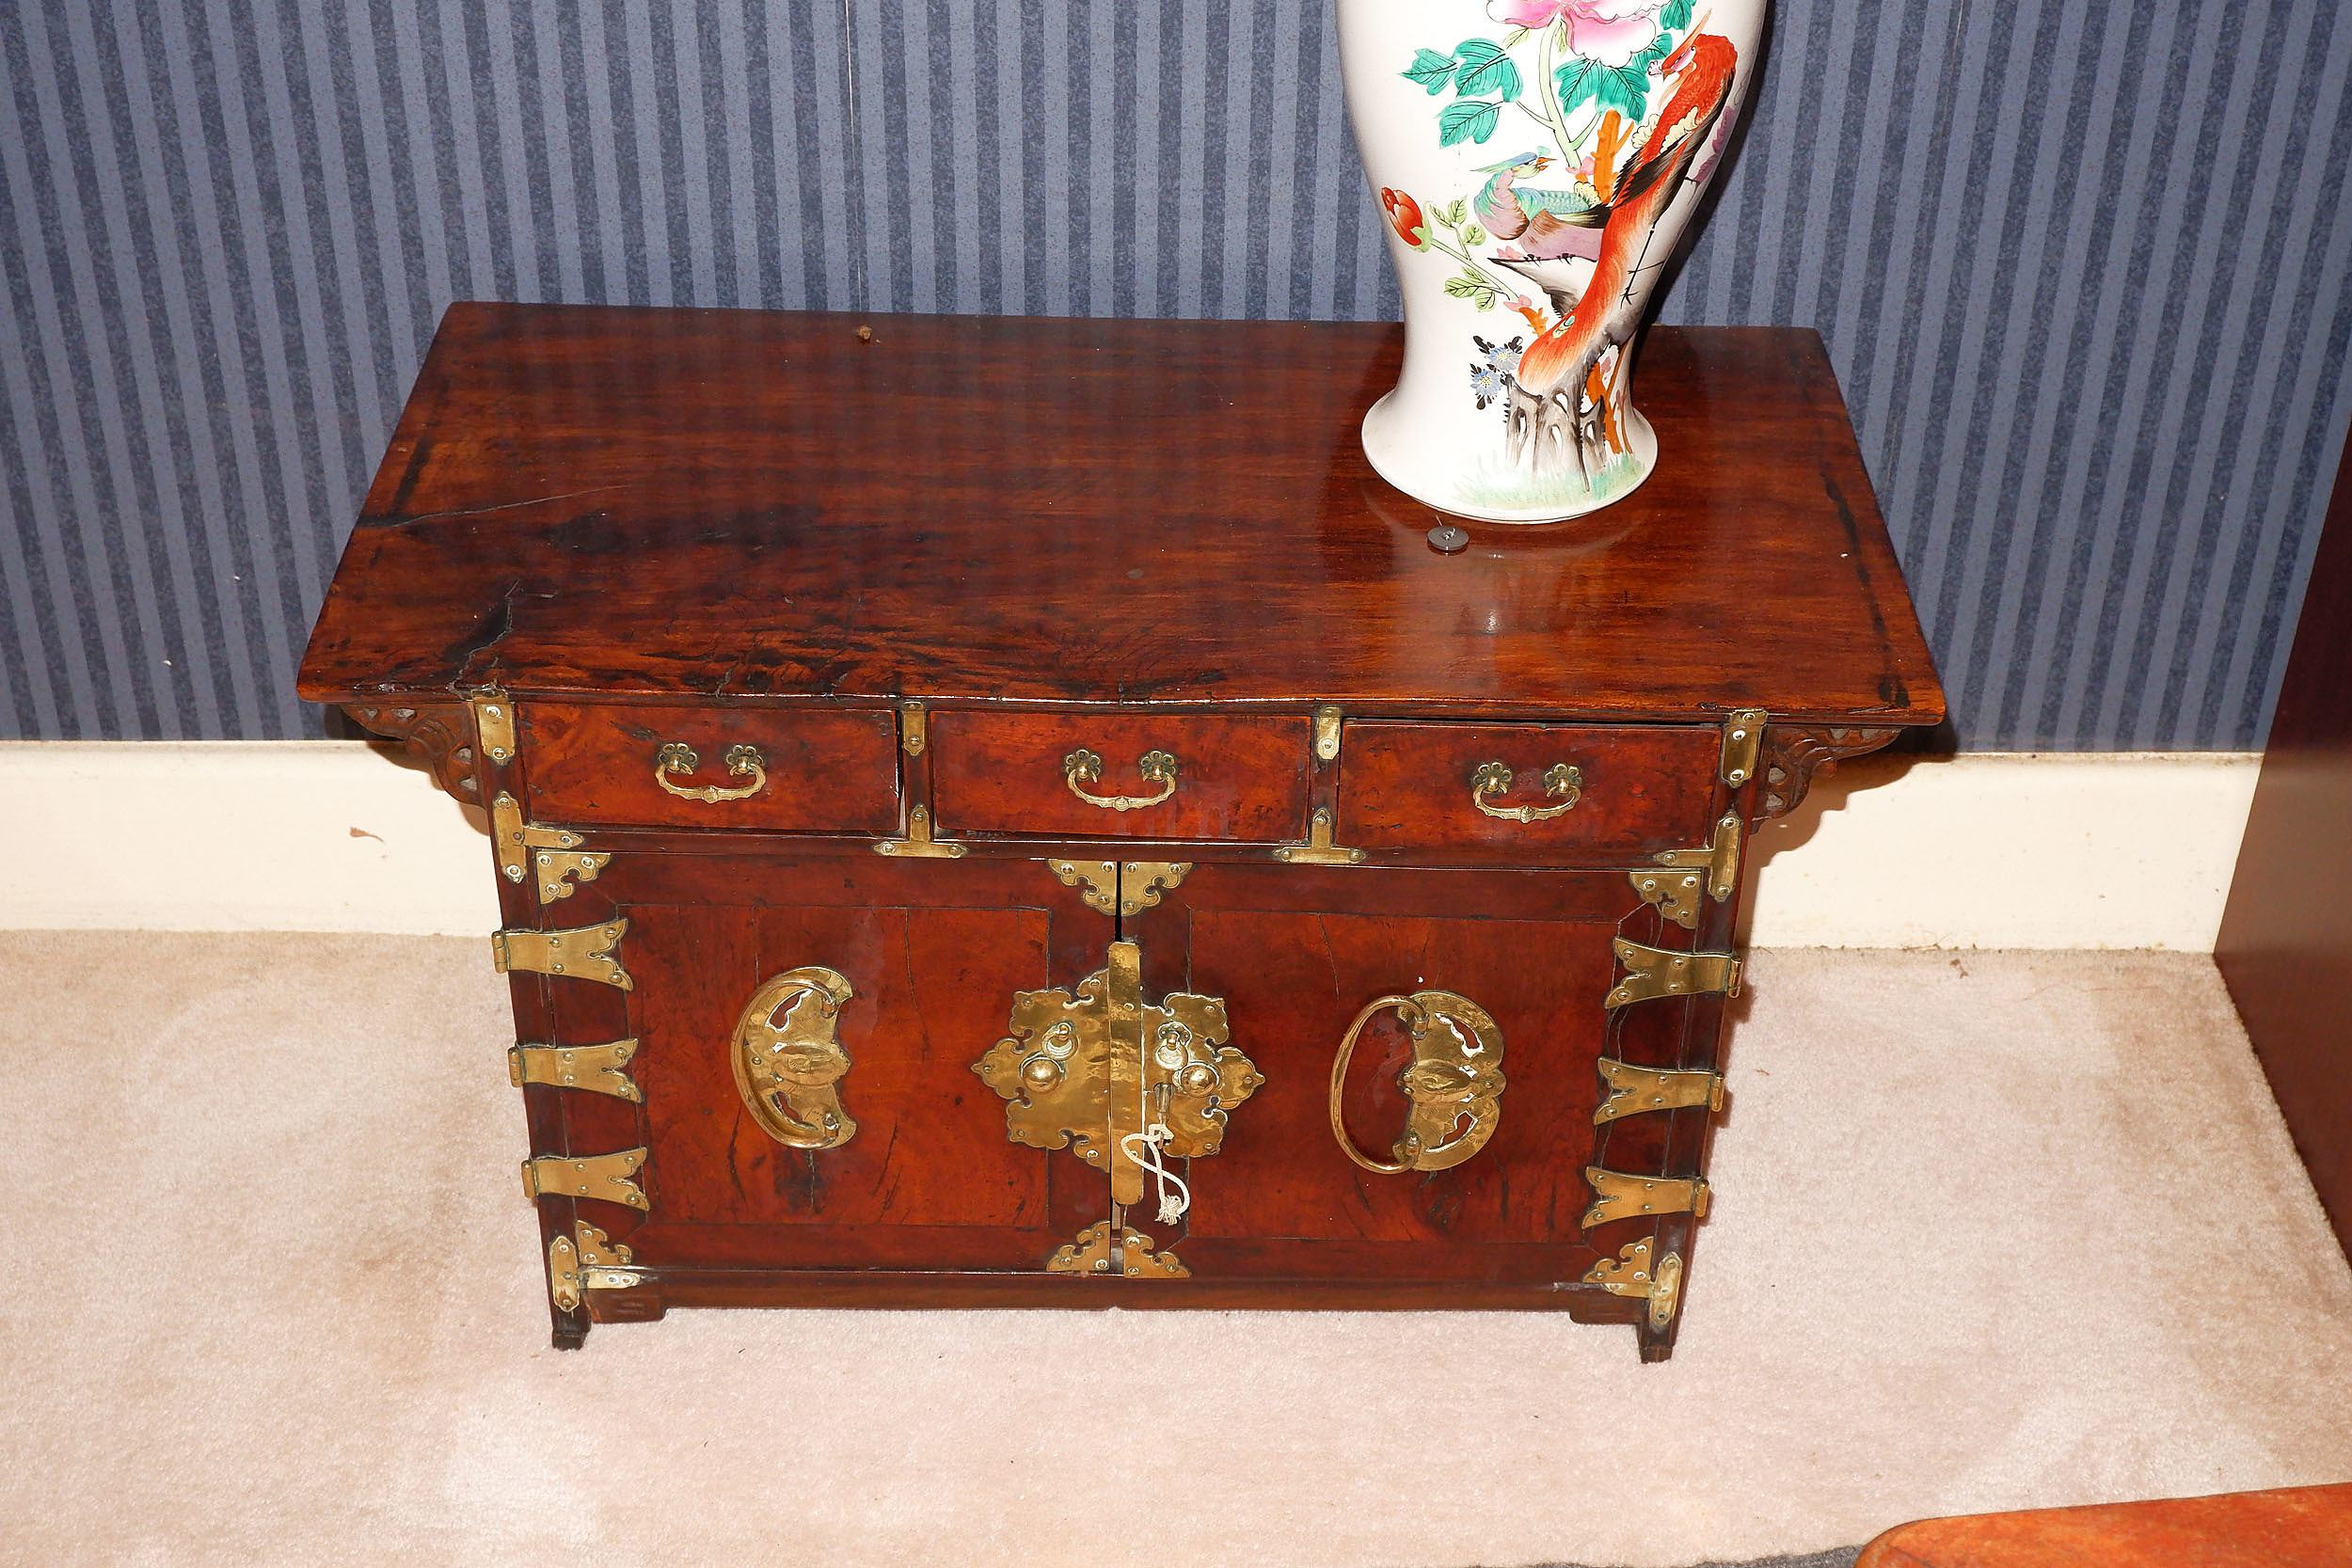 'Small Antique Korean Brass Mounted Burlwood Altar Cabinet'